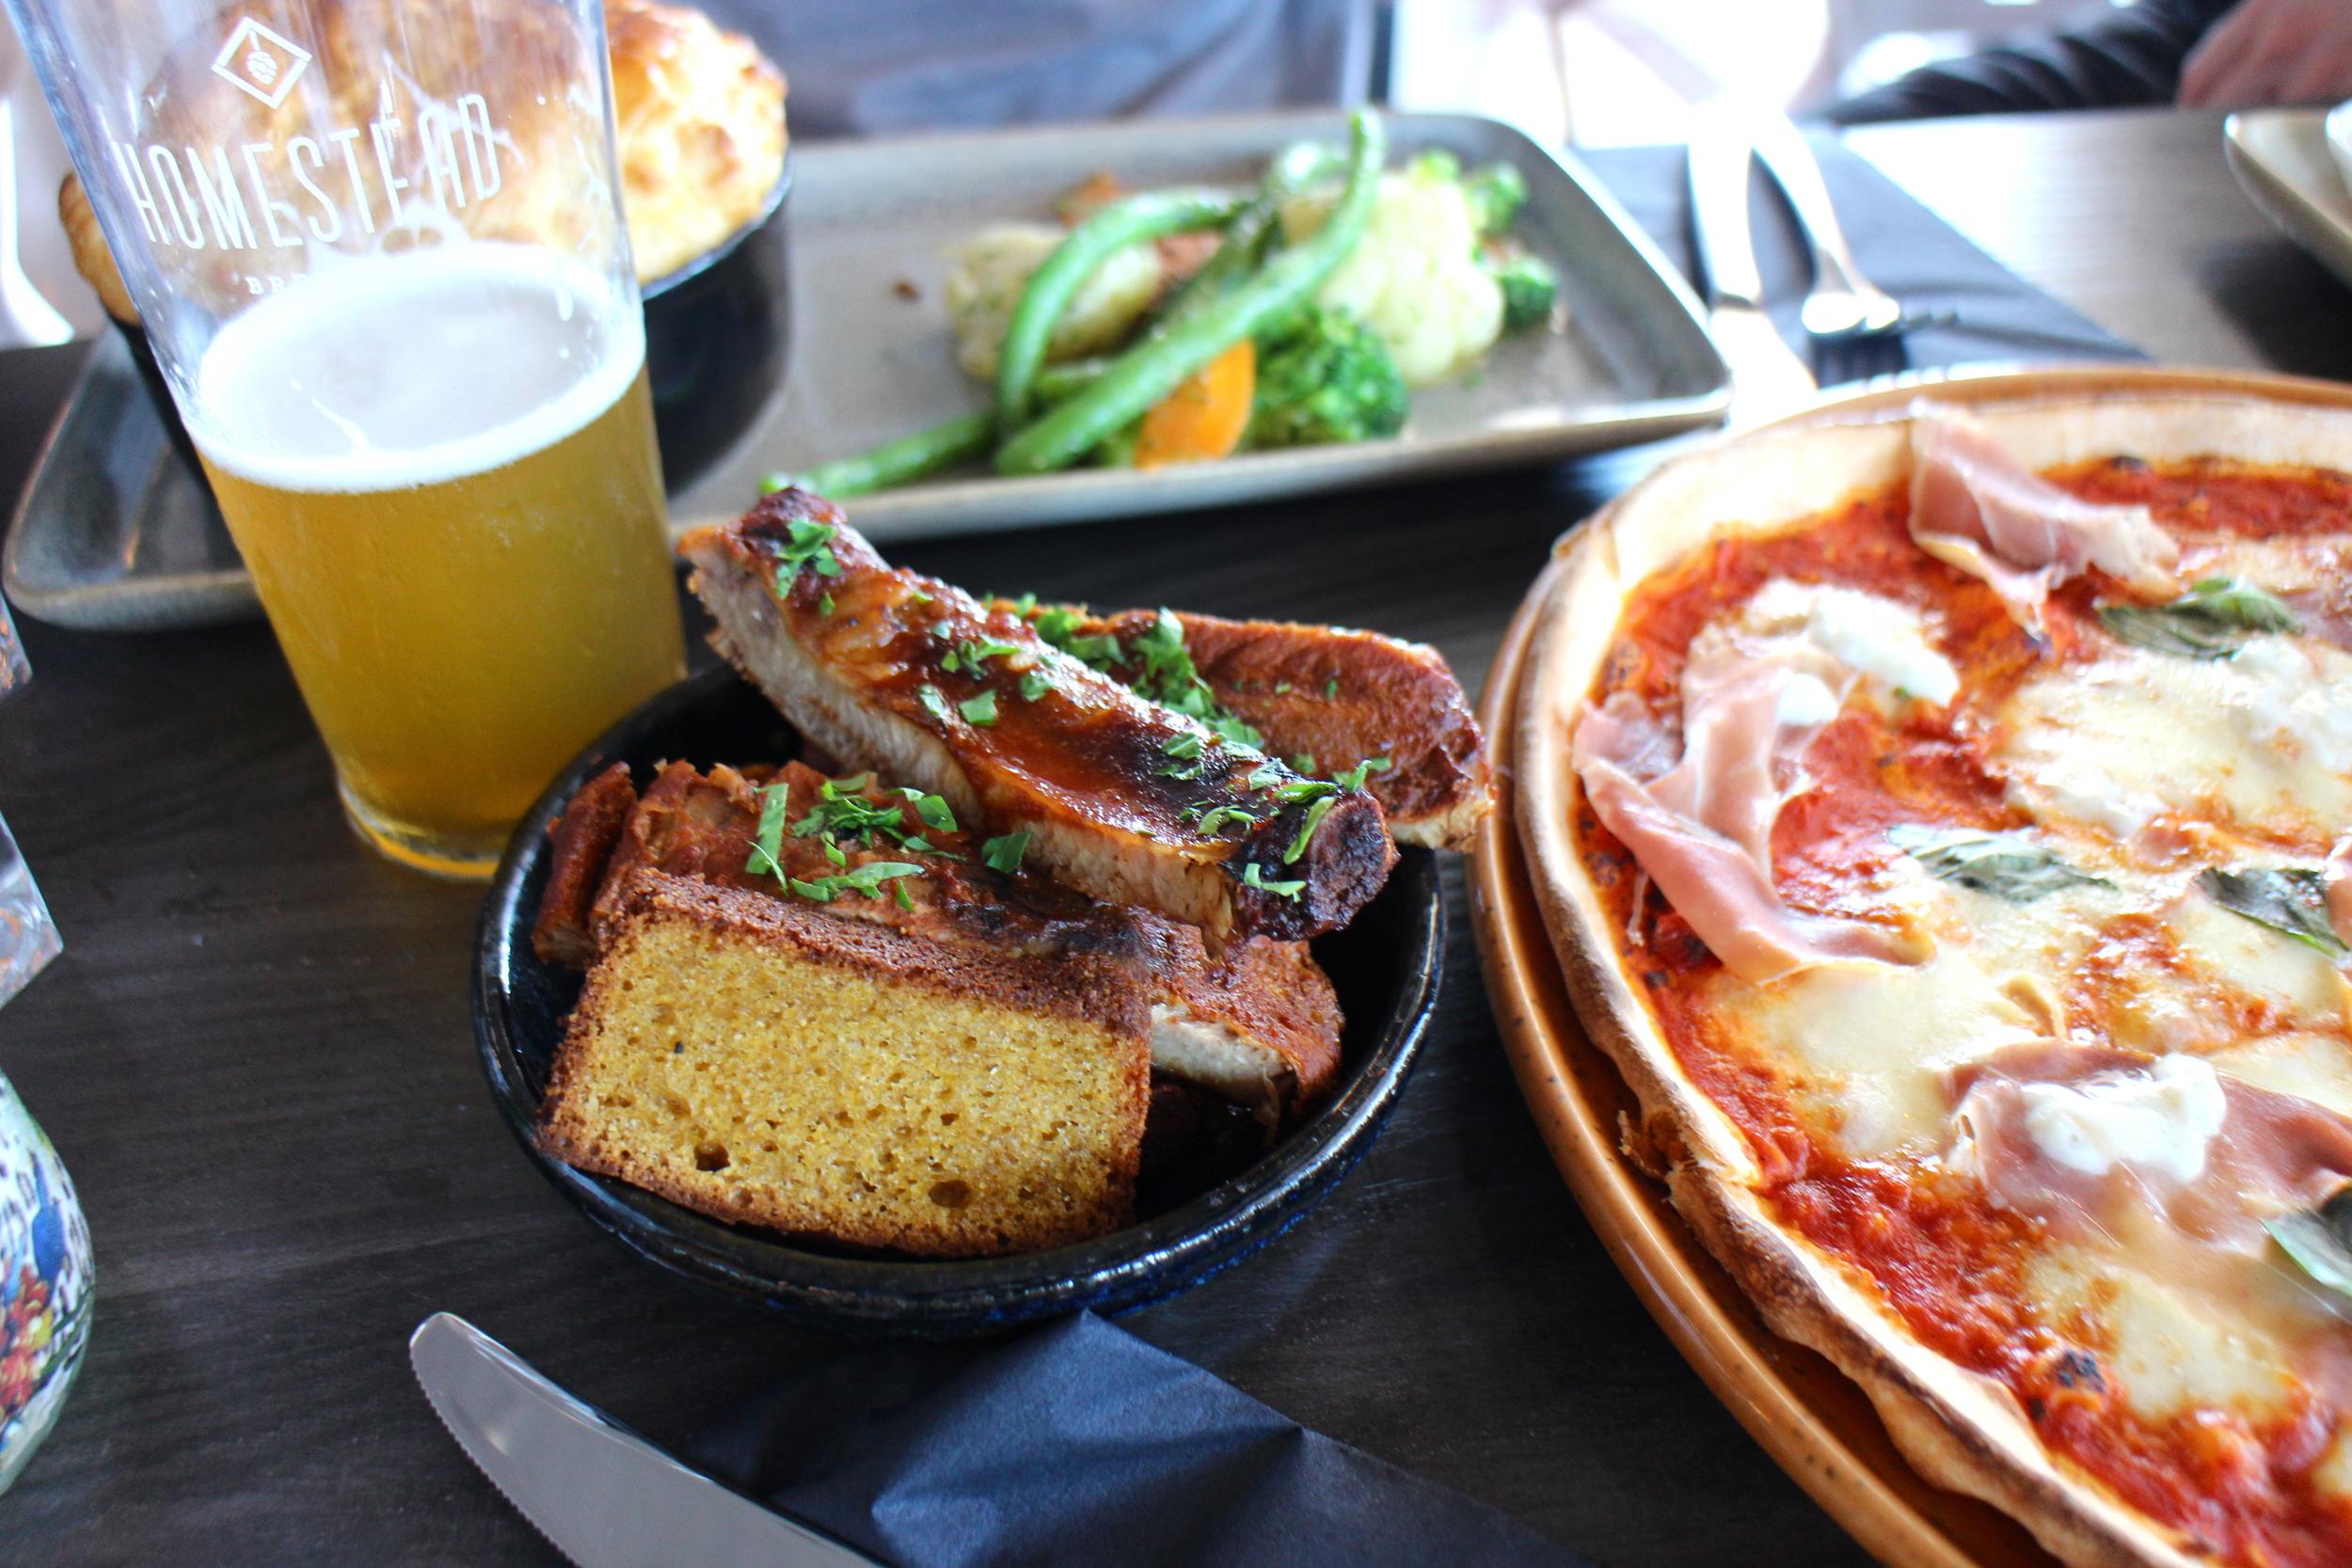 Marinated pork ribs, corn bread